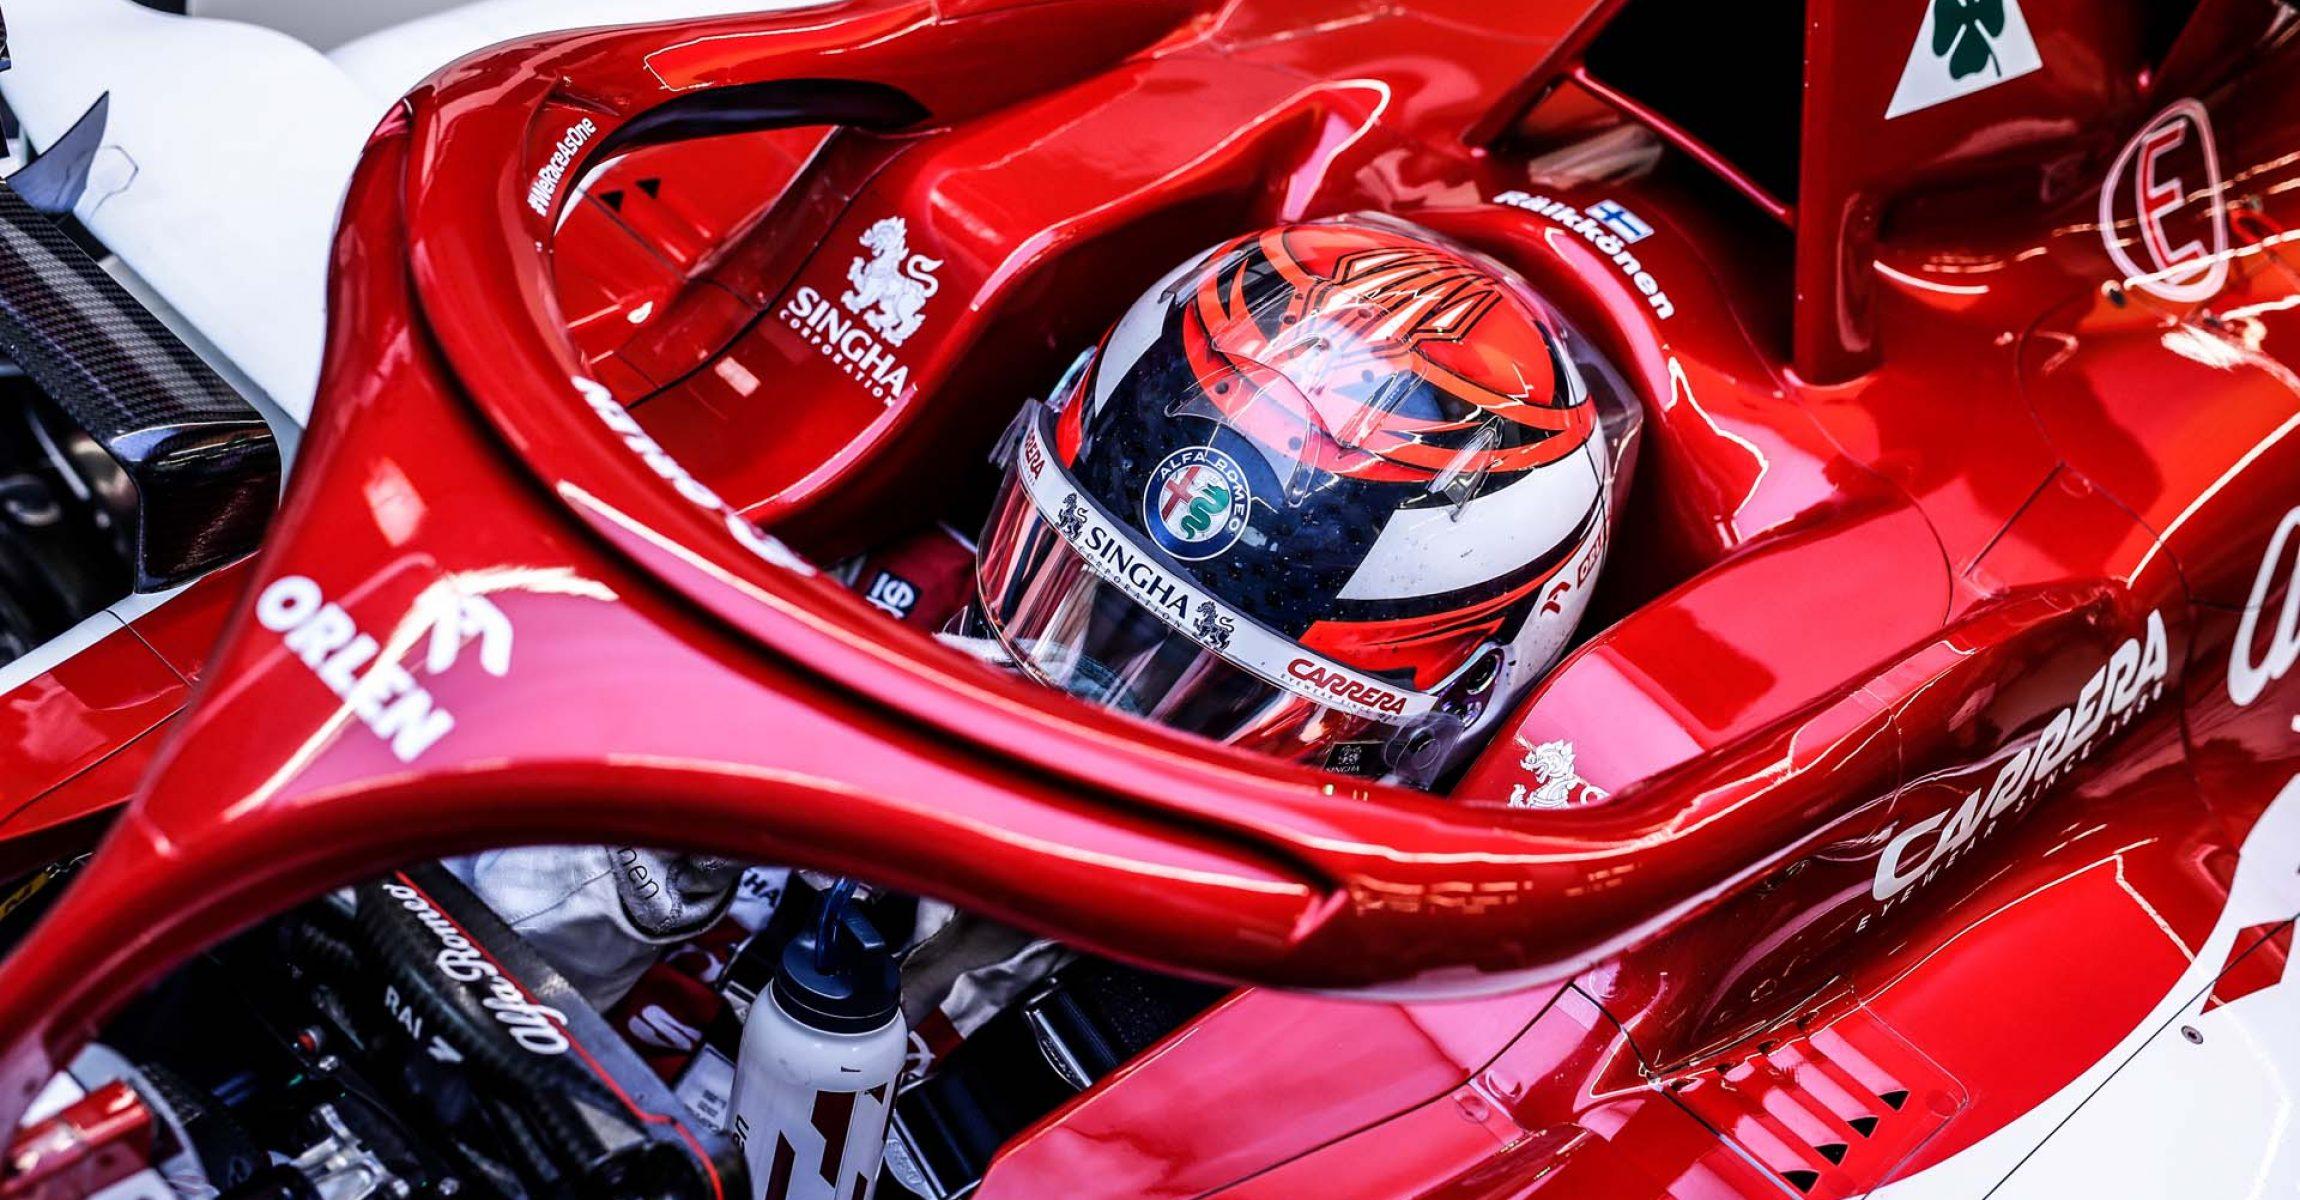 RAIKKONEN Kimi Räikkönen (fin), Alfa Romeo Racing ORLEN C39, portrait during the Formula 1 DHL Turkish Grand Prix 2020, from November 13 to 15, 2020 on the  Intercity Istanbul Park, in Tuzla, near Istanbul, Turkey - Photo Florent Gooden / DPPI